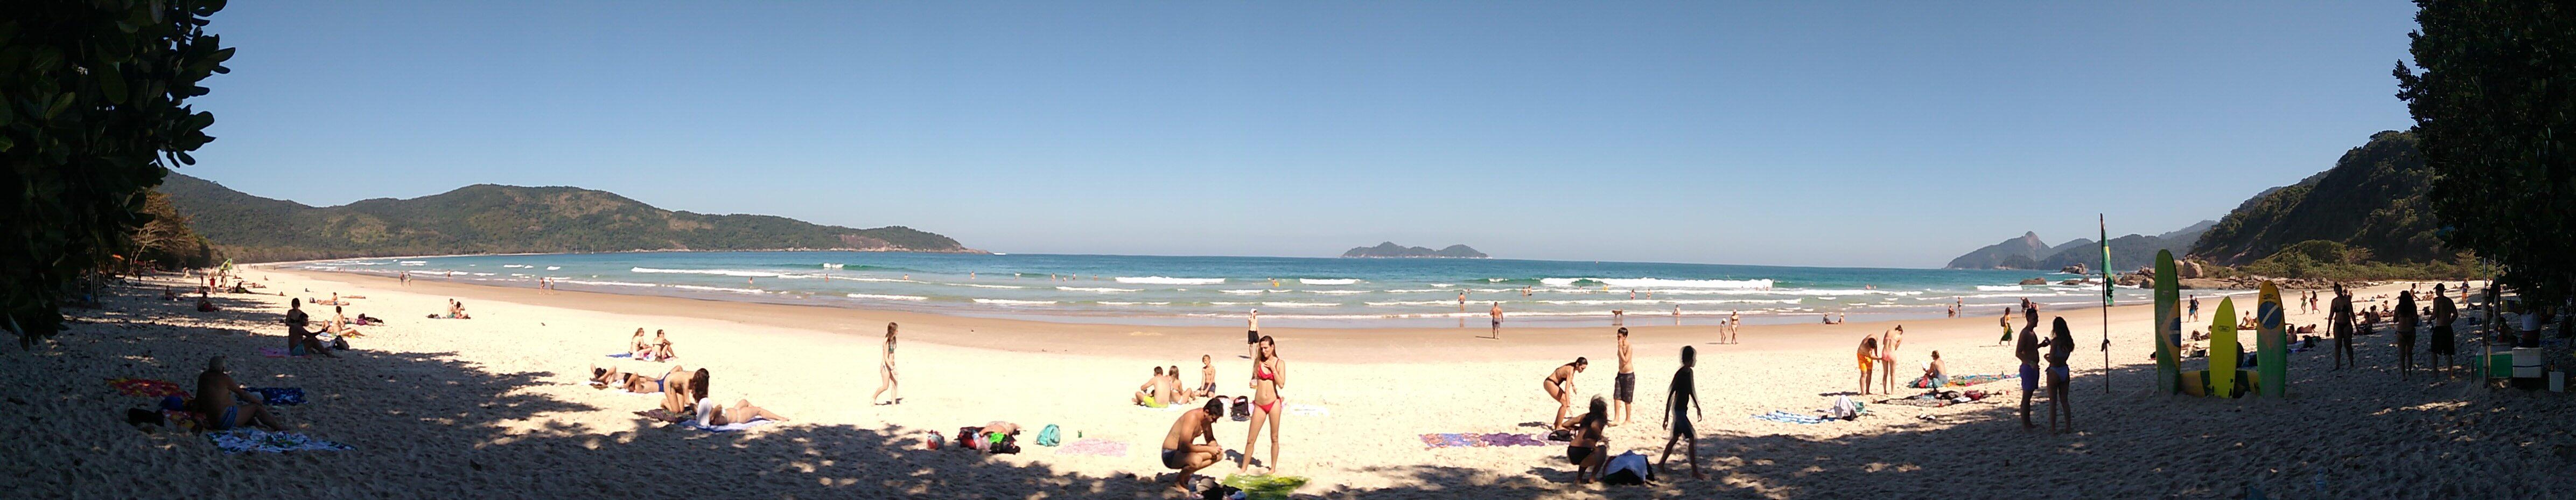 Praia de Lopes Mendes  em Ilha Grande  2